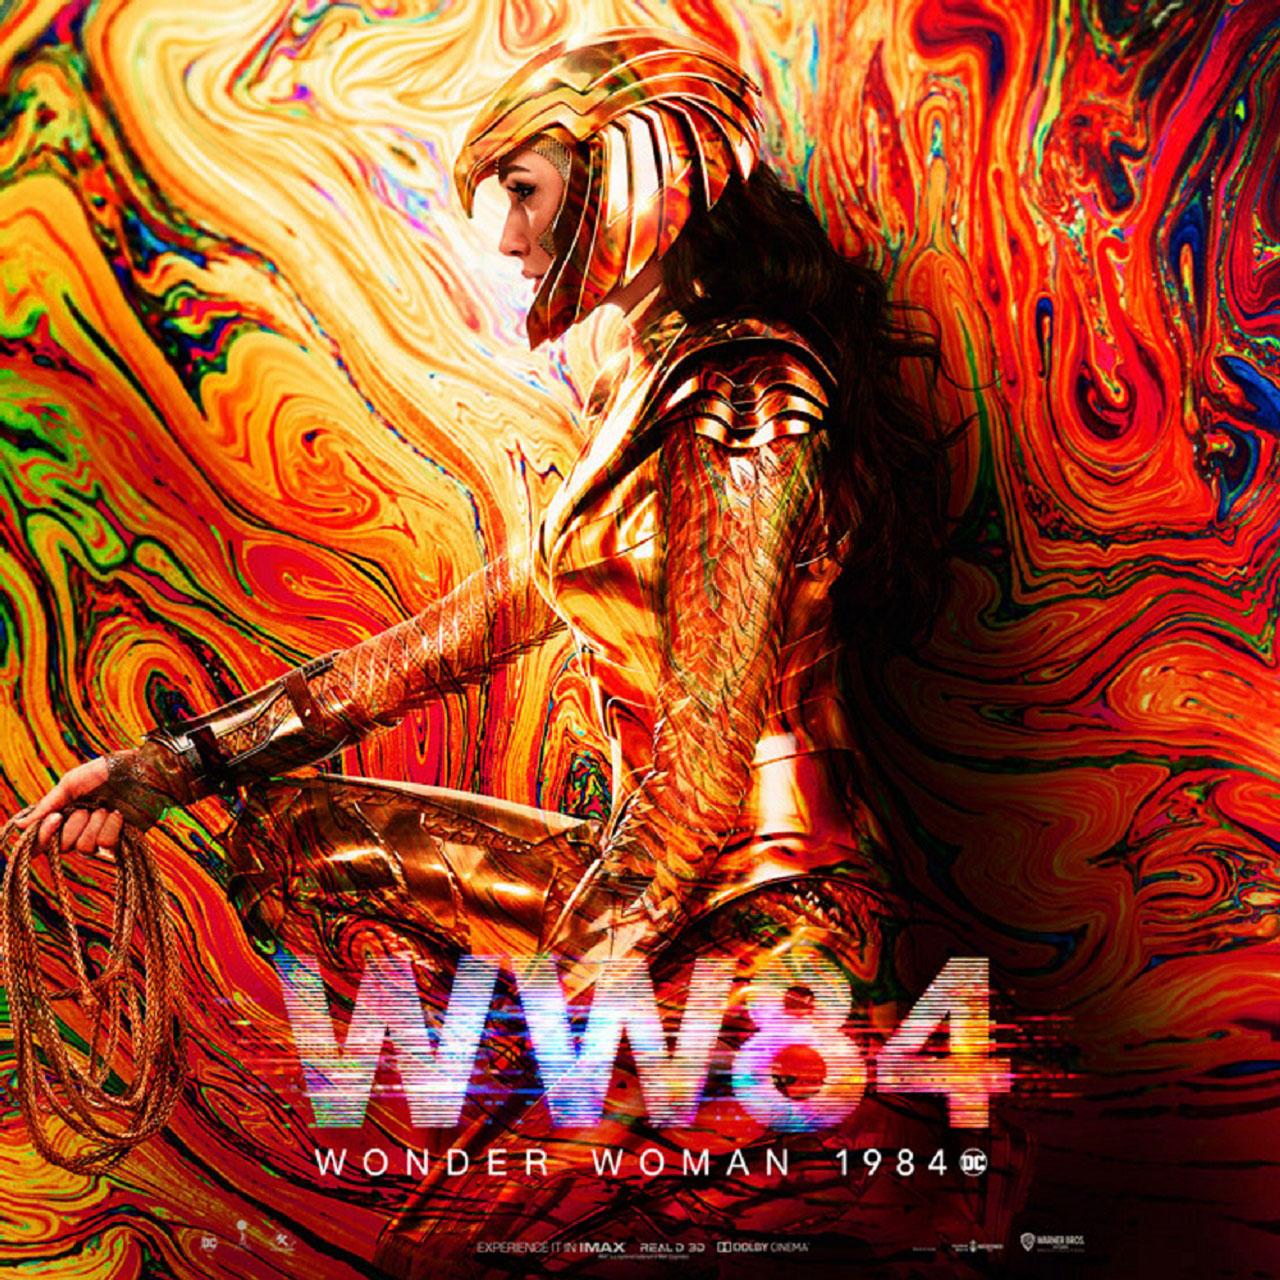 wonder-woman-1984.jpg